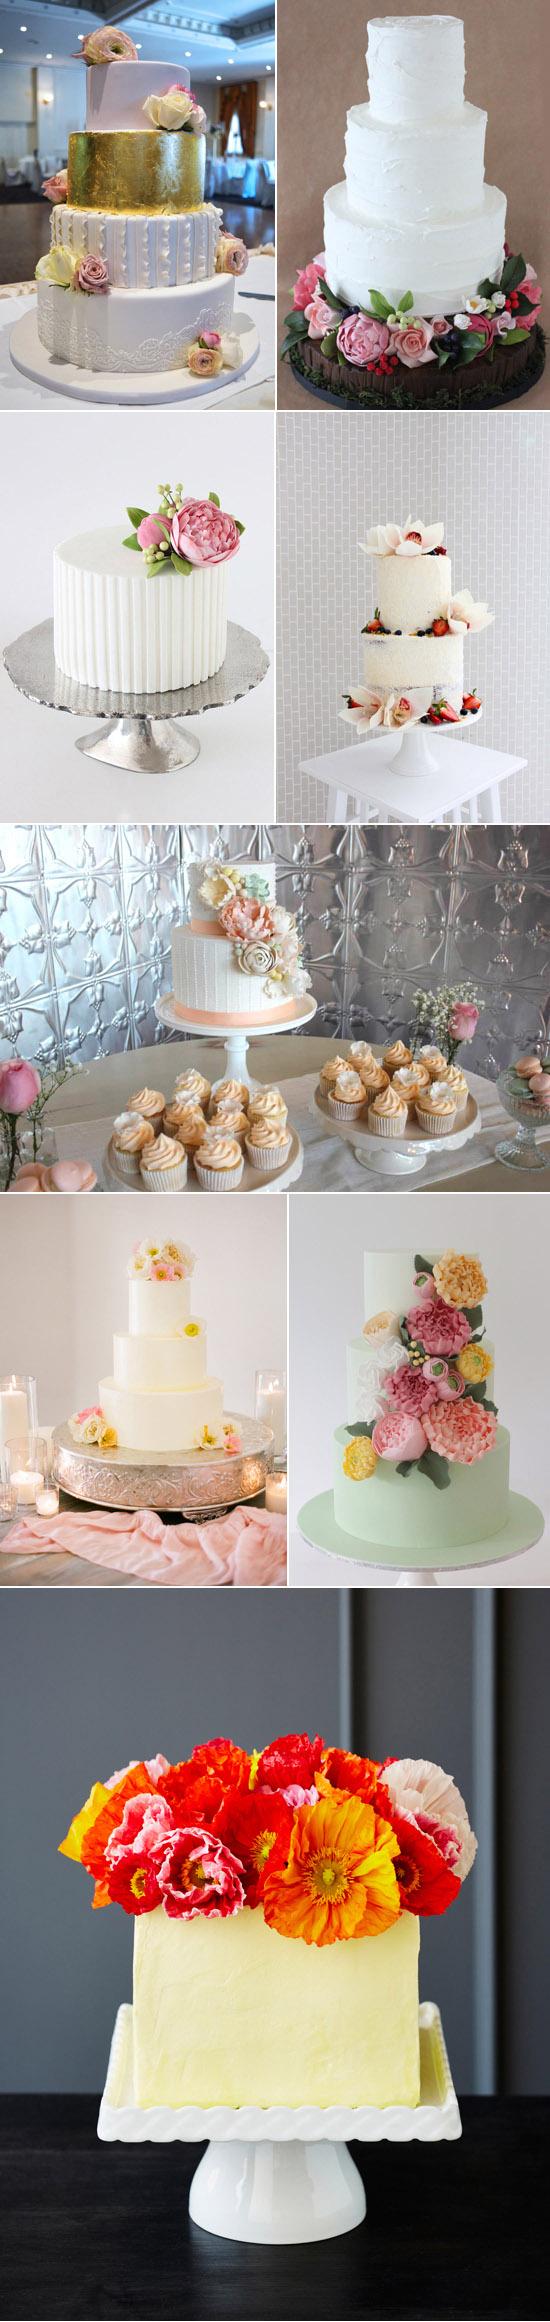 Spring wedding cake ideas Spring Wedding Cakes